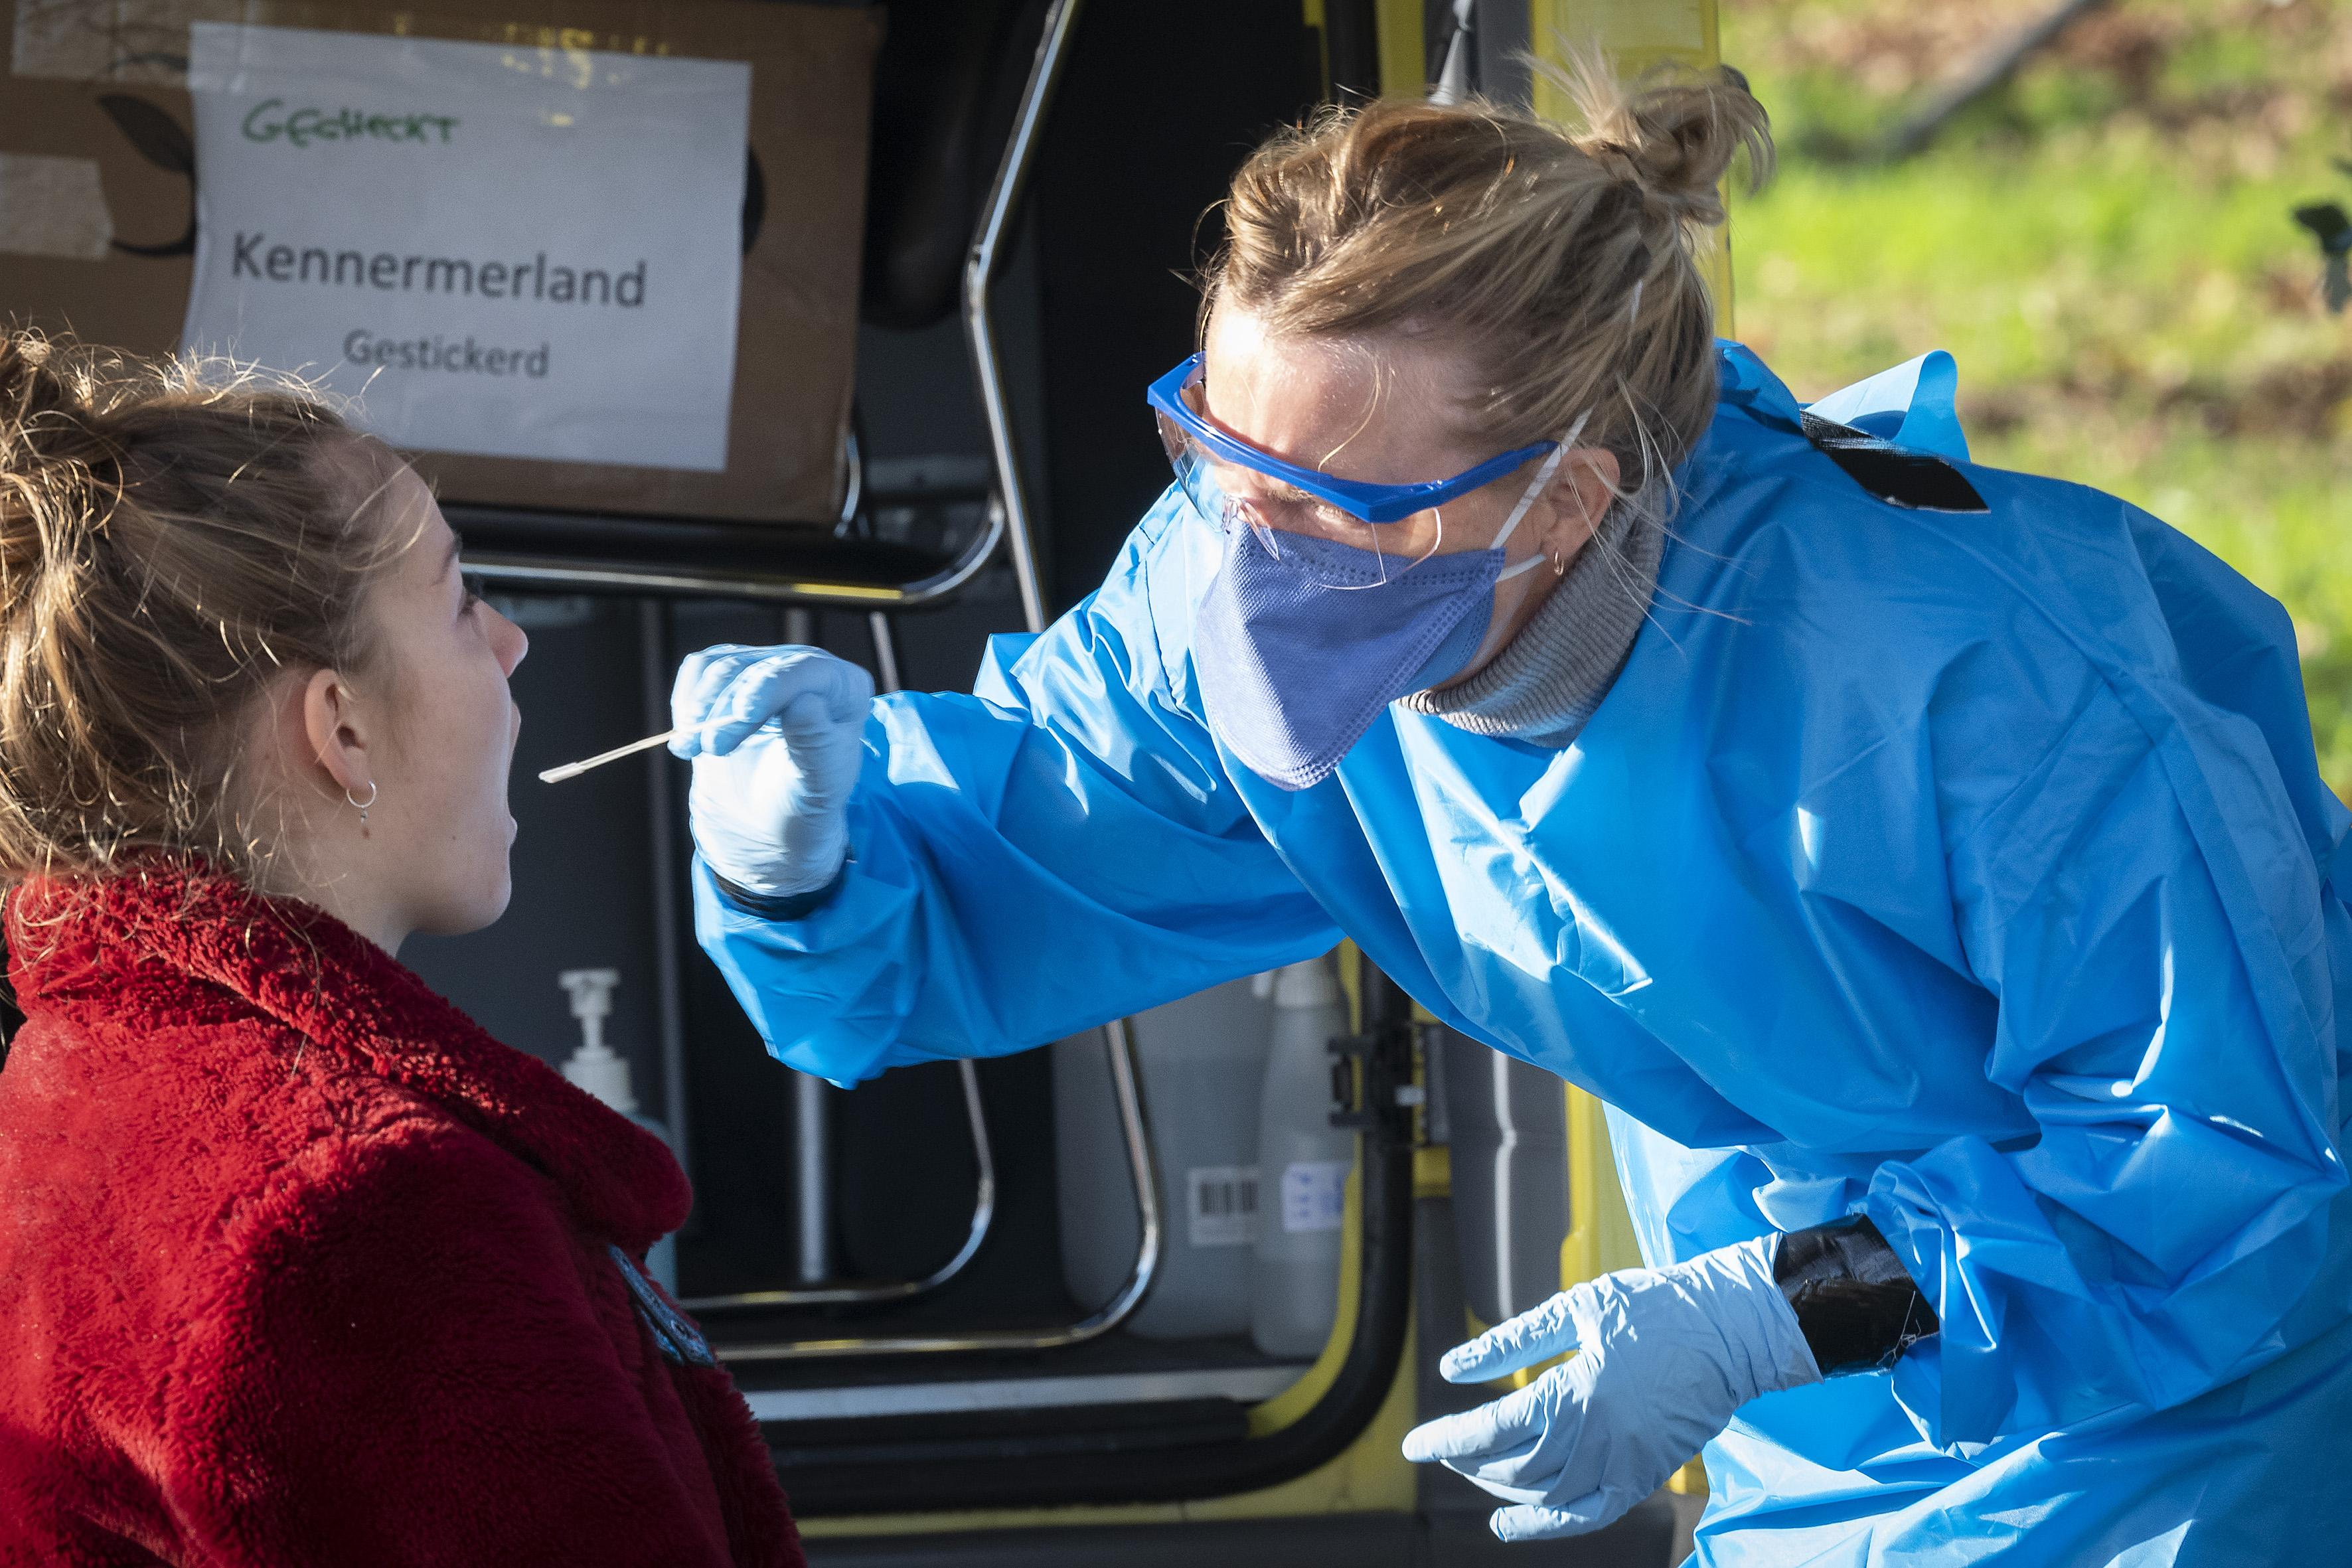 Coronacijfers zondag: laagterecord in Haarlemmermeer